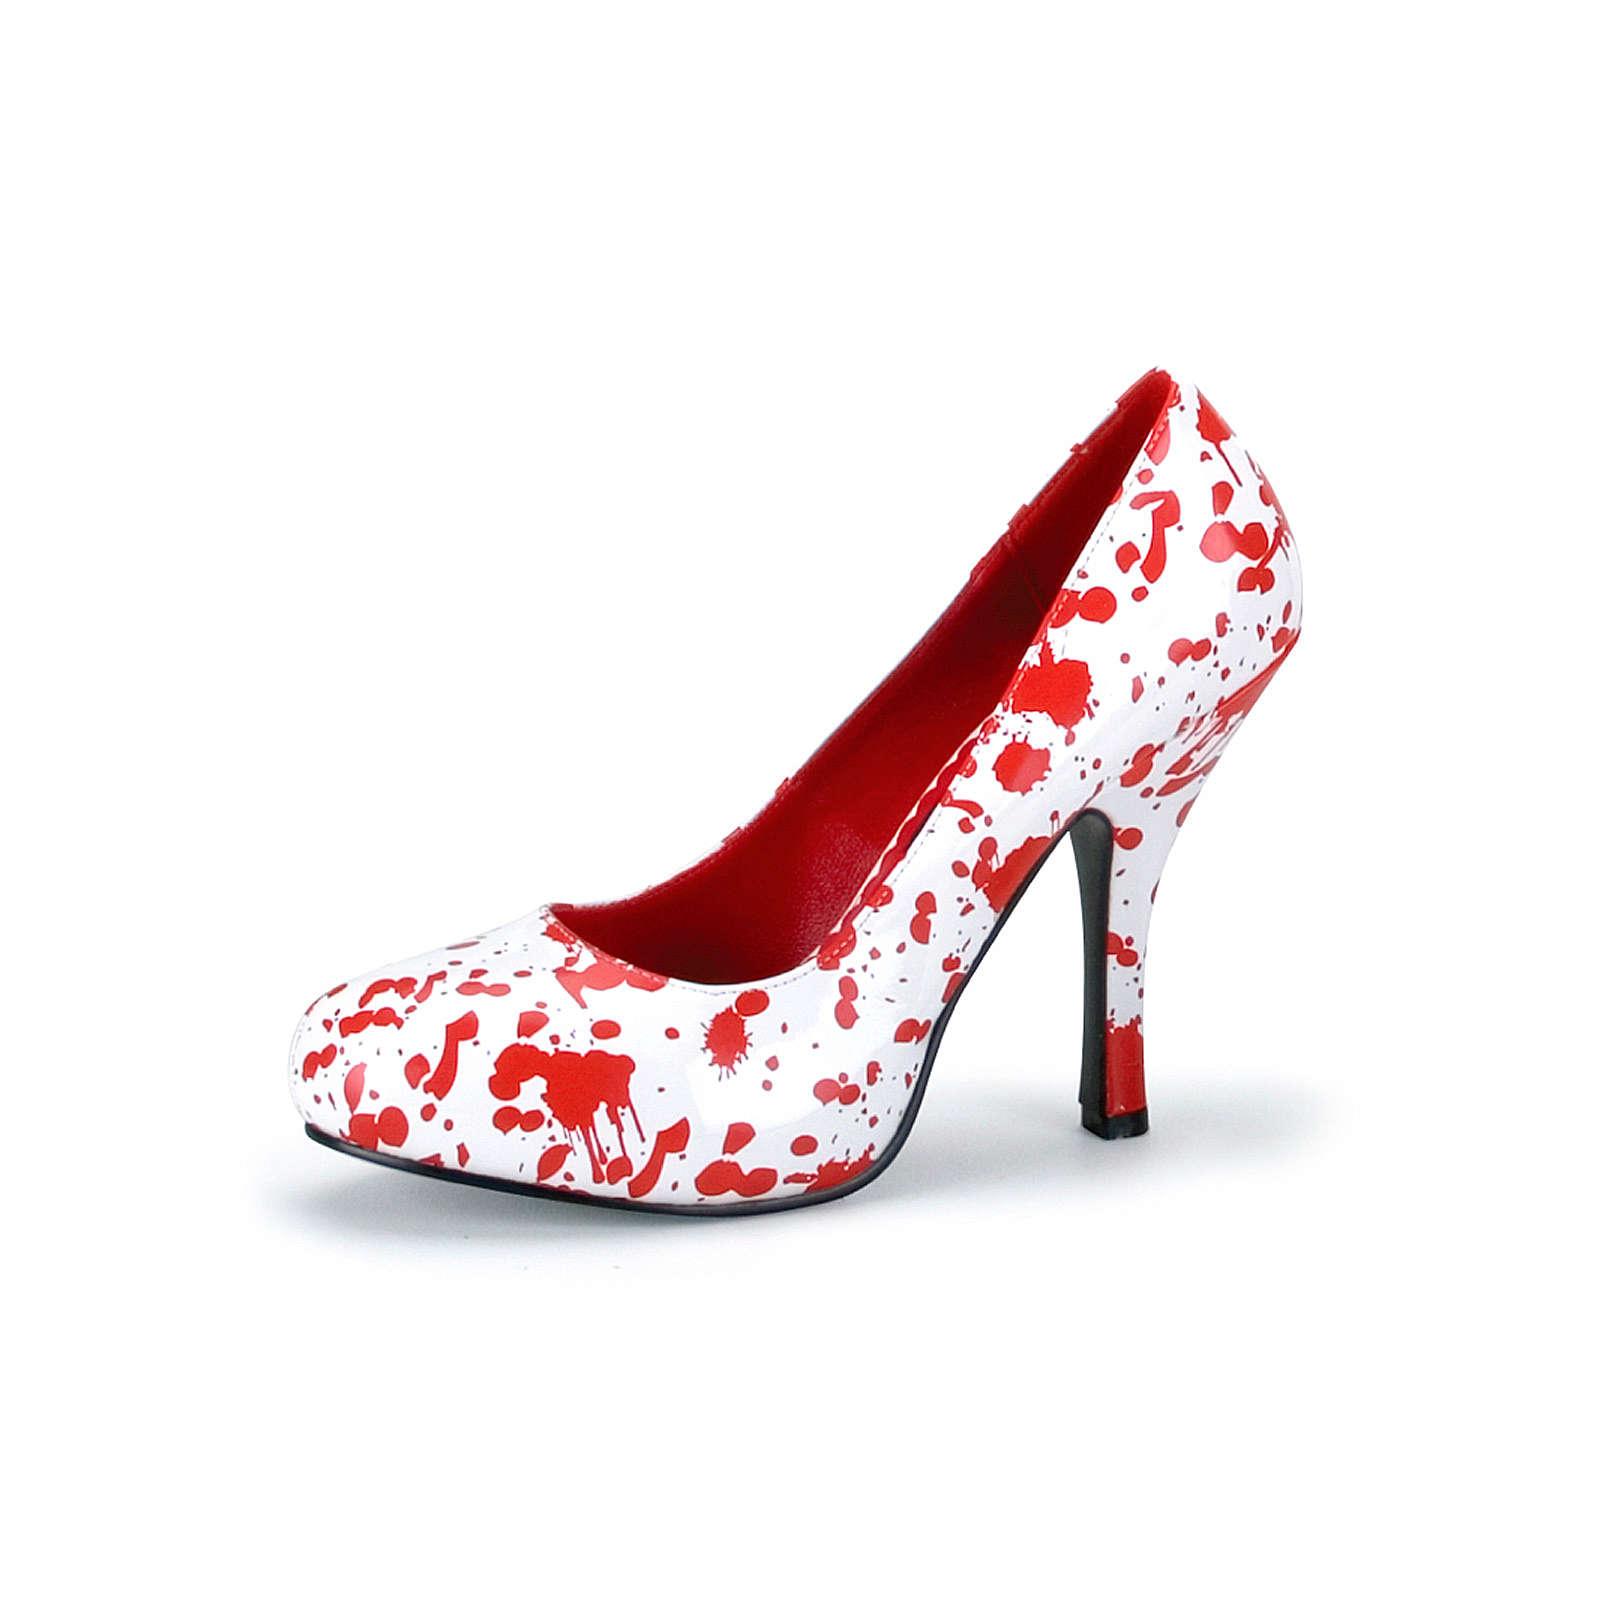 FUNTASMA® Kostümschuhe Krankenschwester Bloody Klassische Pumps weiß Damen Gr. 37